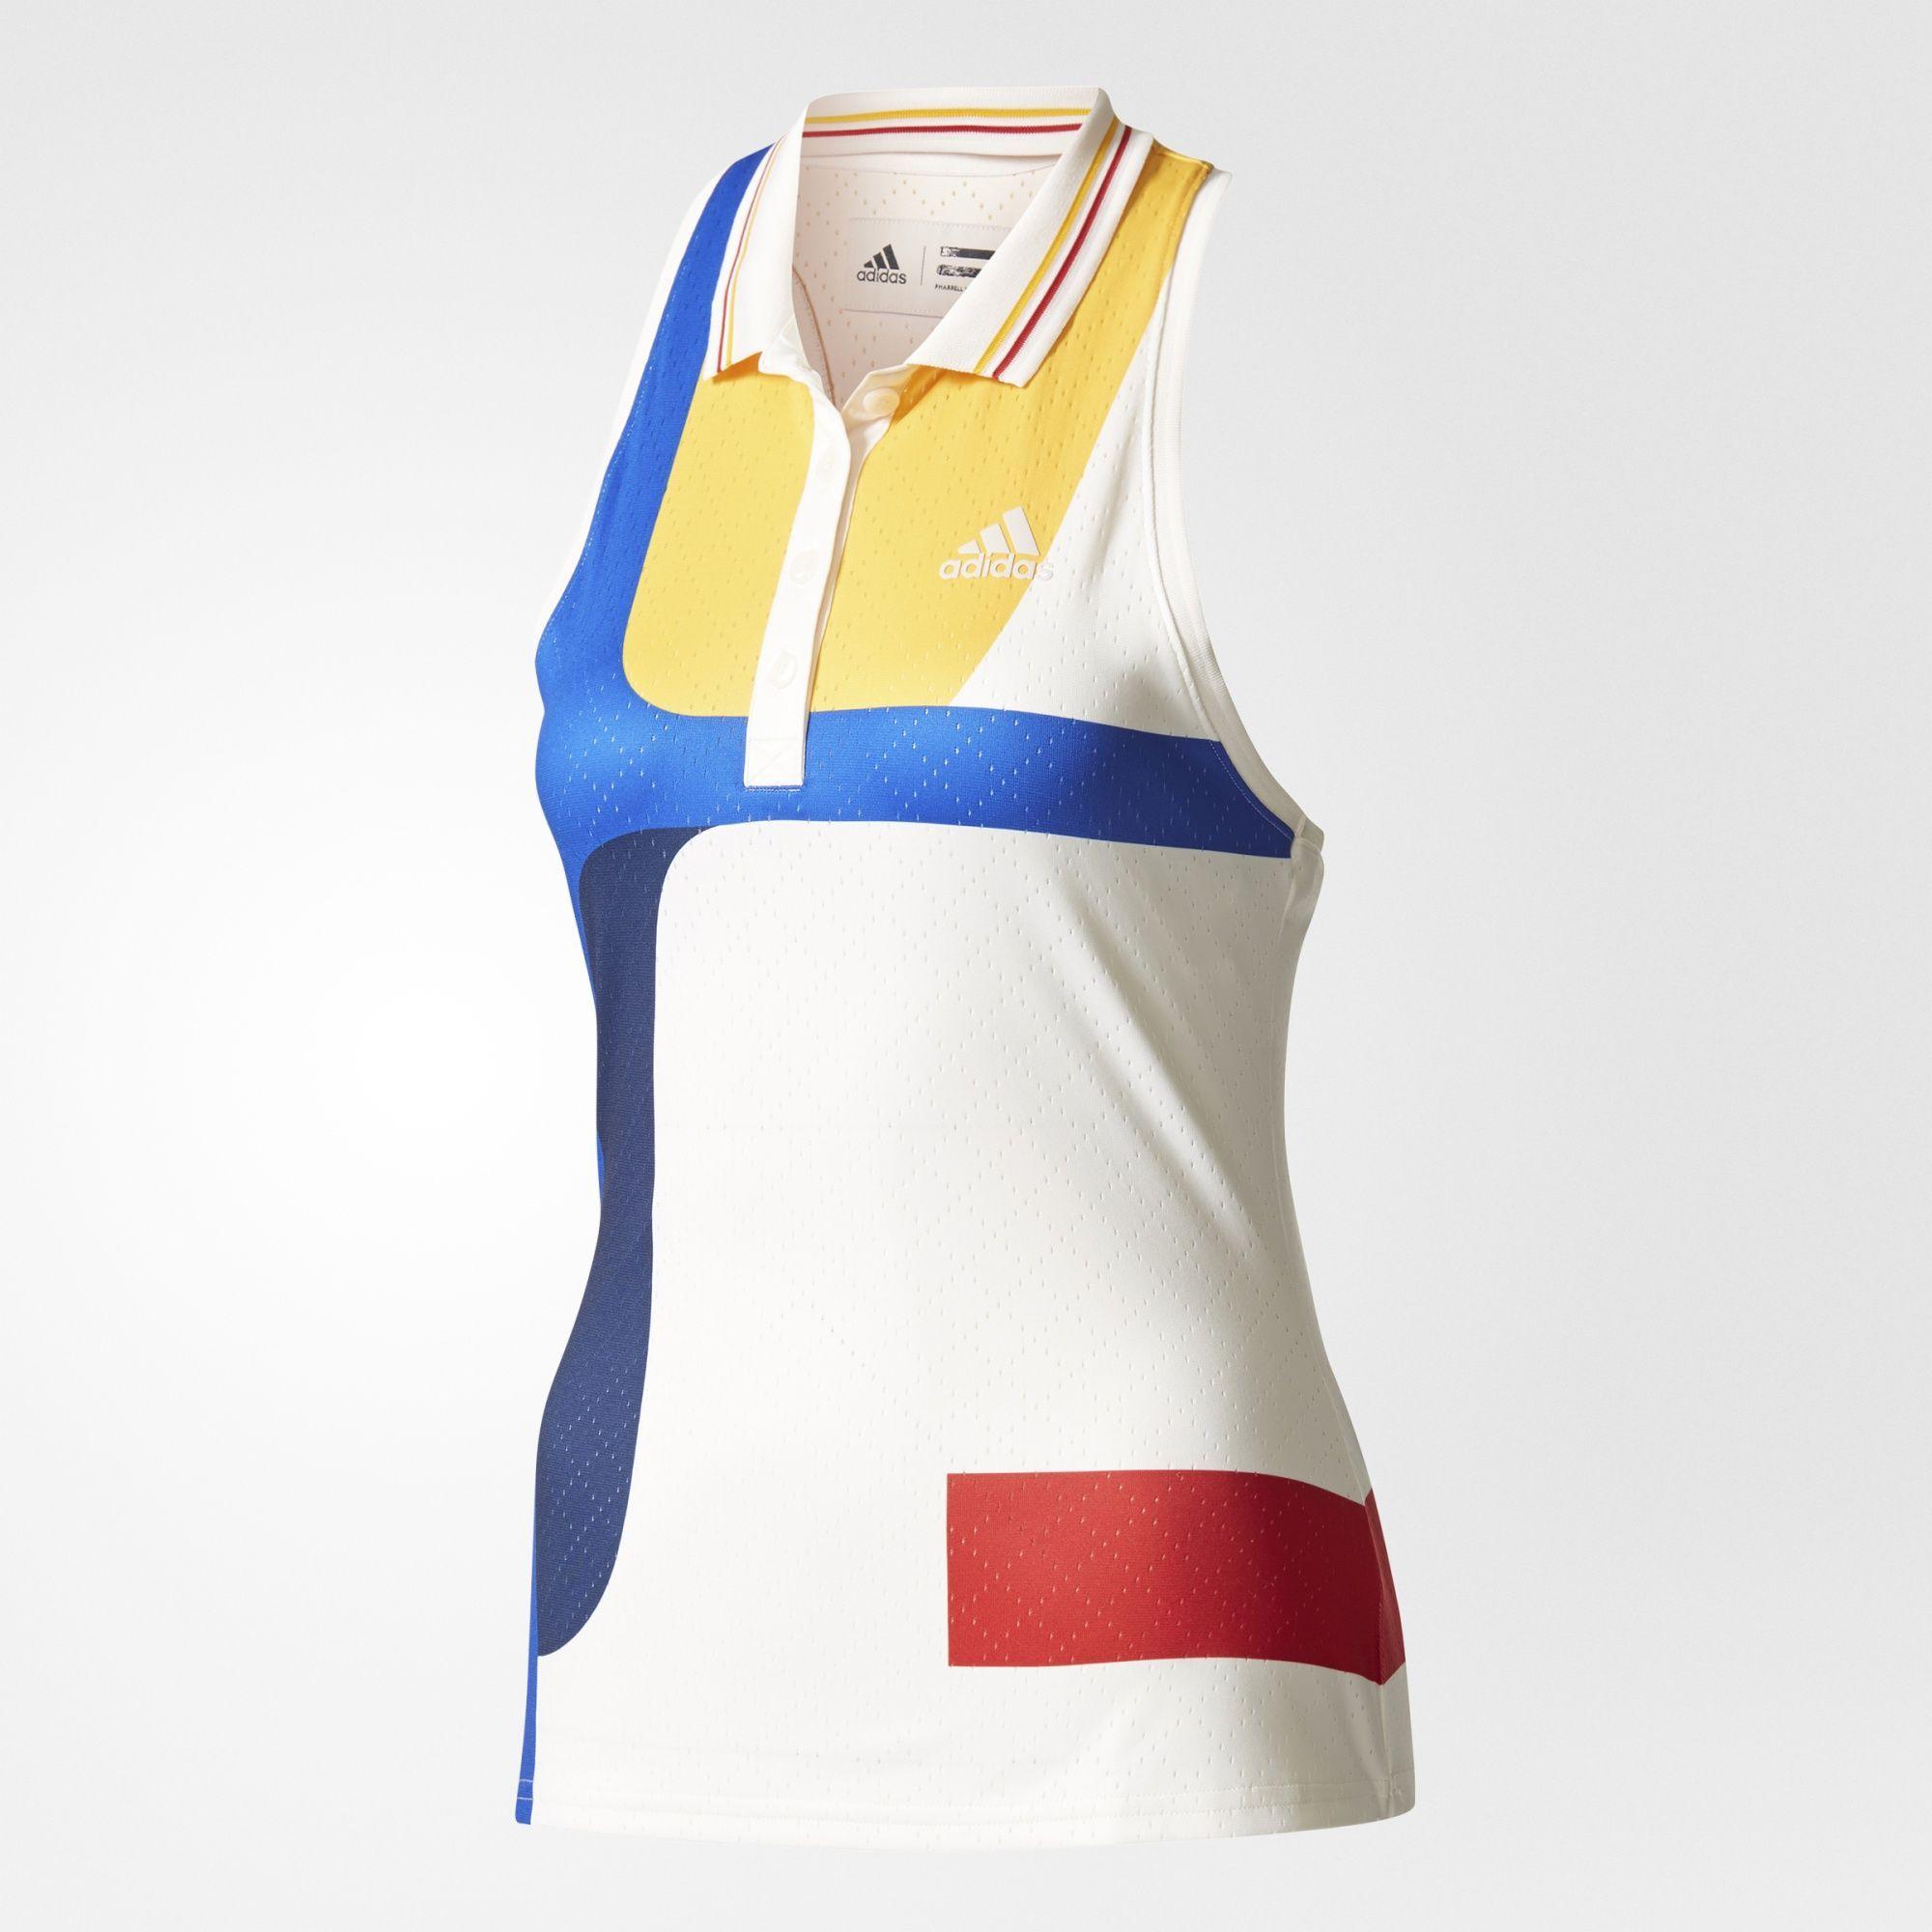 adidas - New York Colorblock Tank Top   Tennis outfit women ...